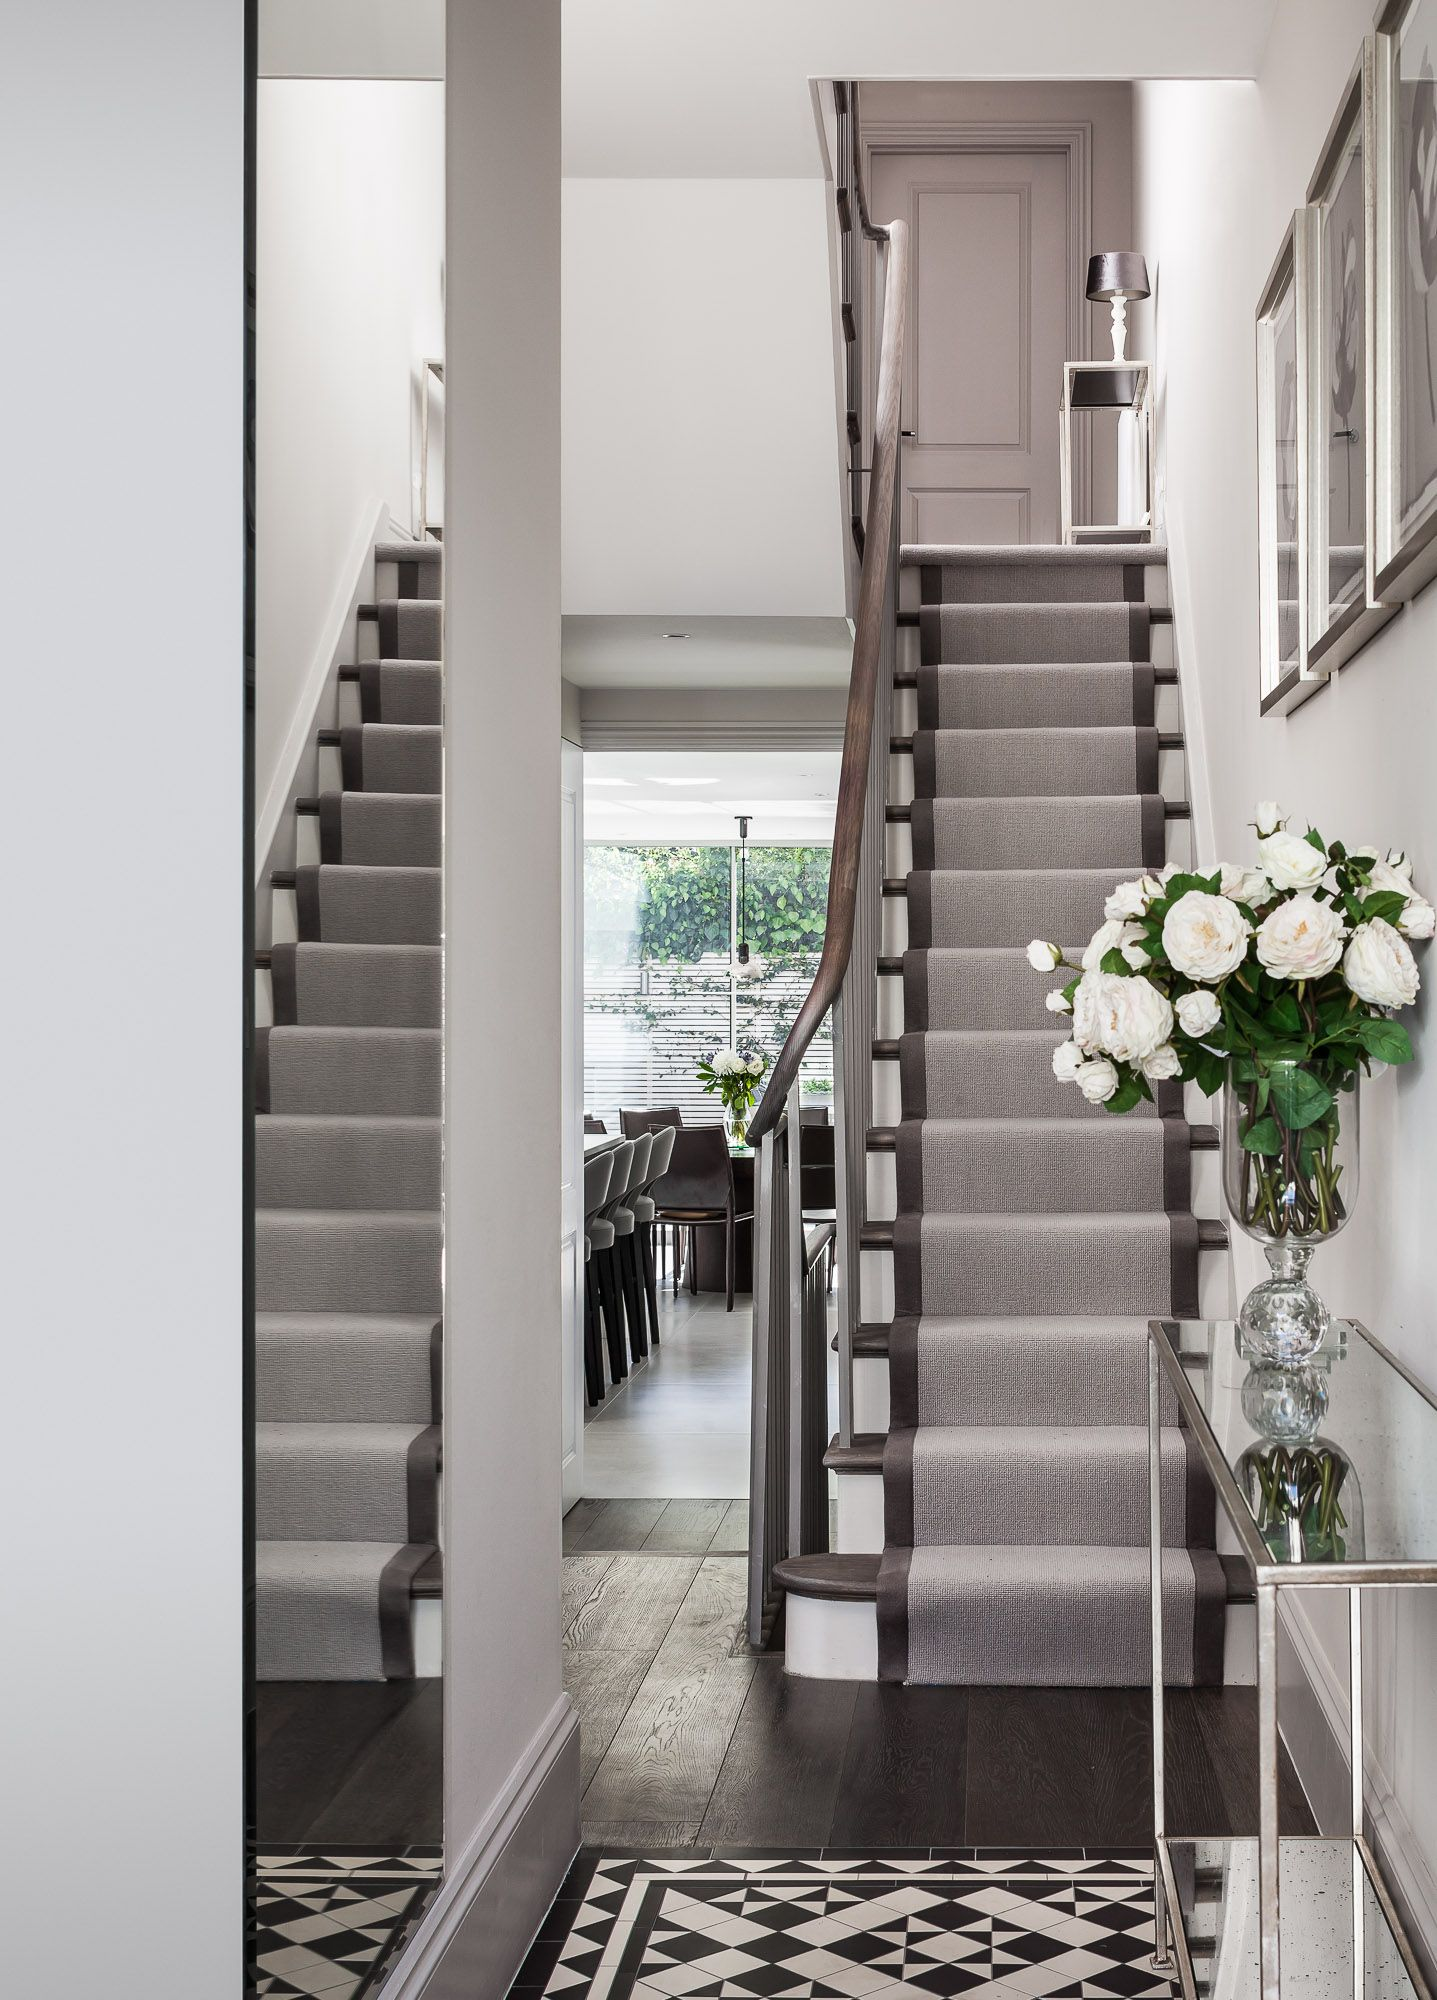 Turned Handrail In Oak And Tapped Carpet Runner Victorian Tiles In Entrance Www Emrdesign Co Uk Victorian Hallway Hallway Decorating Hallway Designs